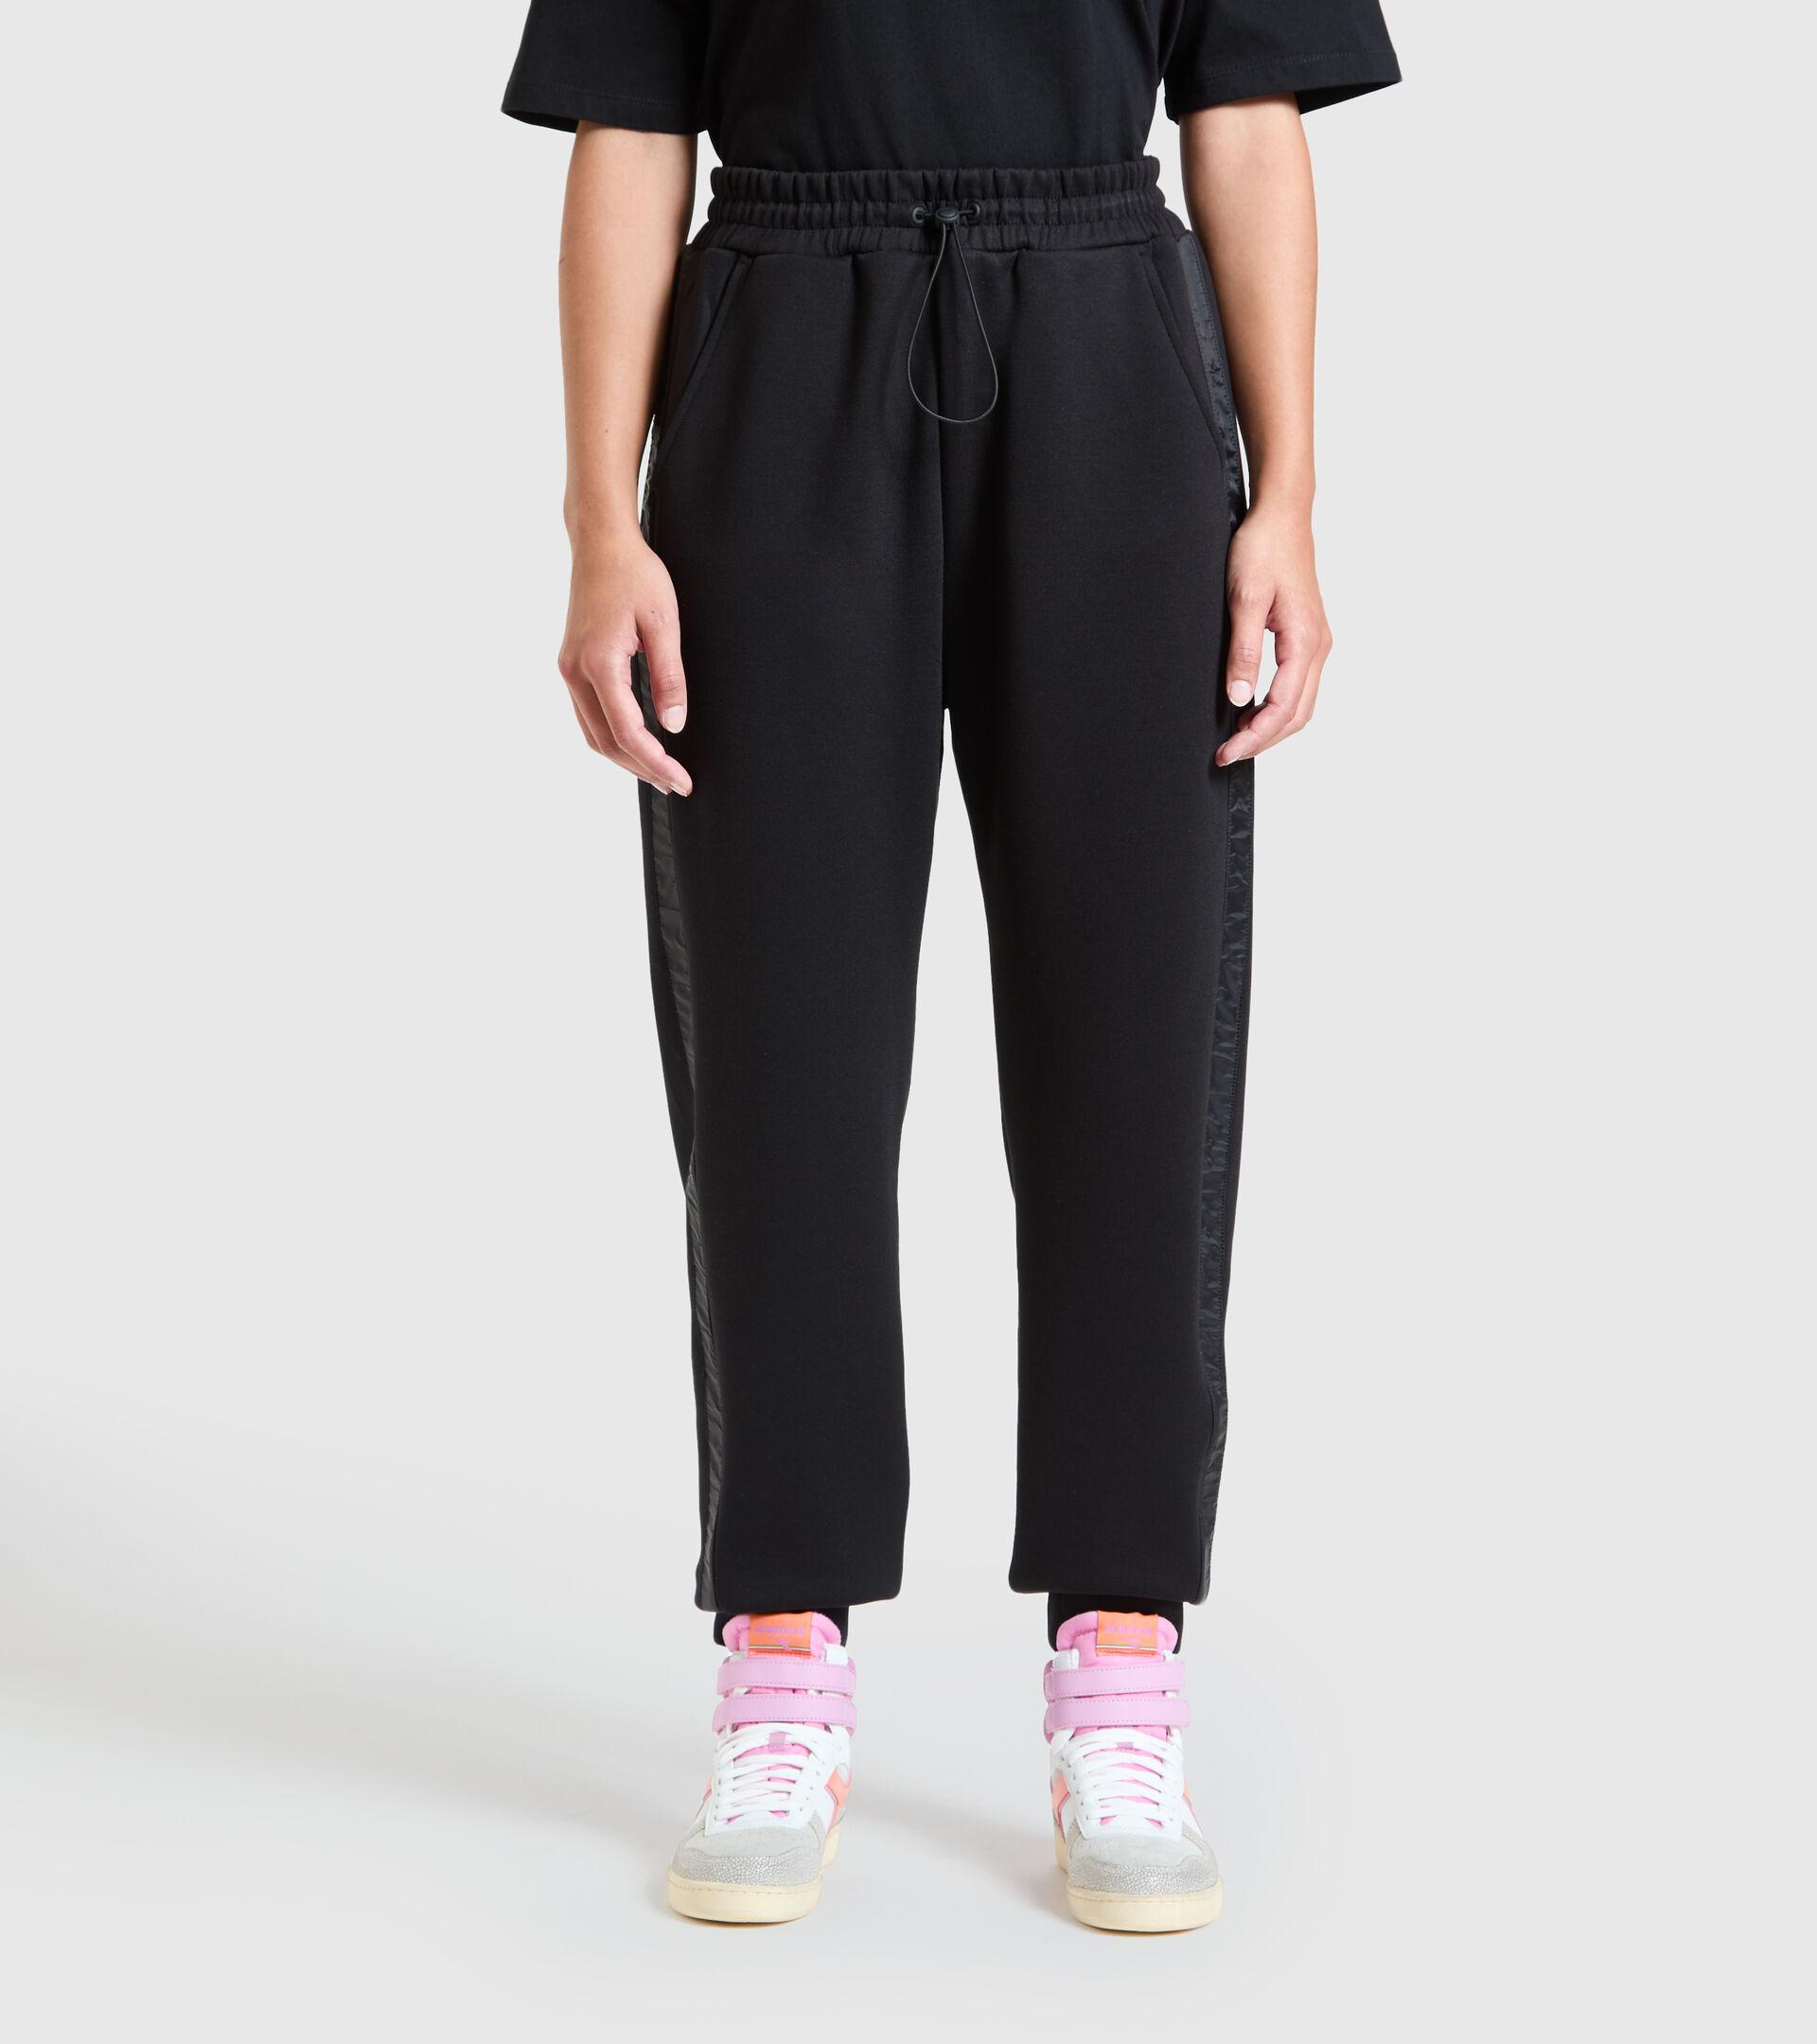 Pantalones deportivos - Mujer  L. PANT URBANITY NEGRO - Diadora